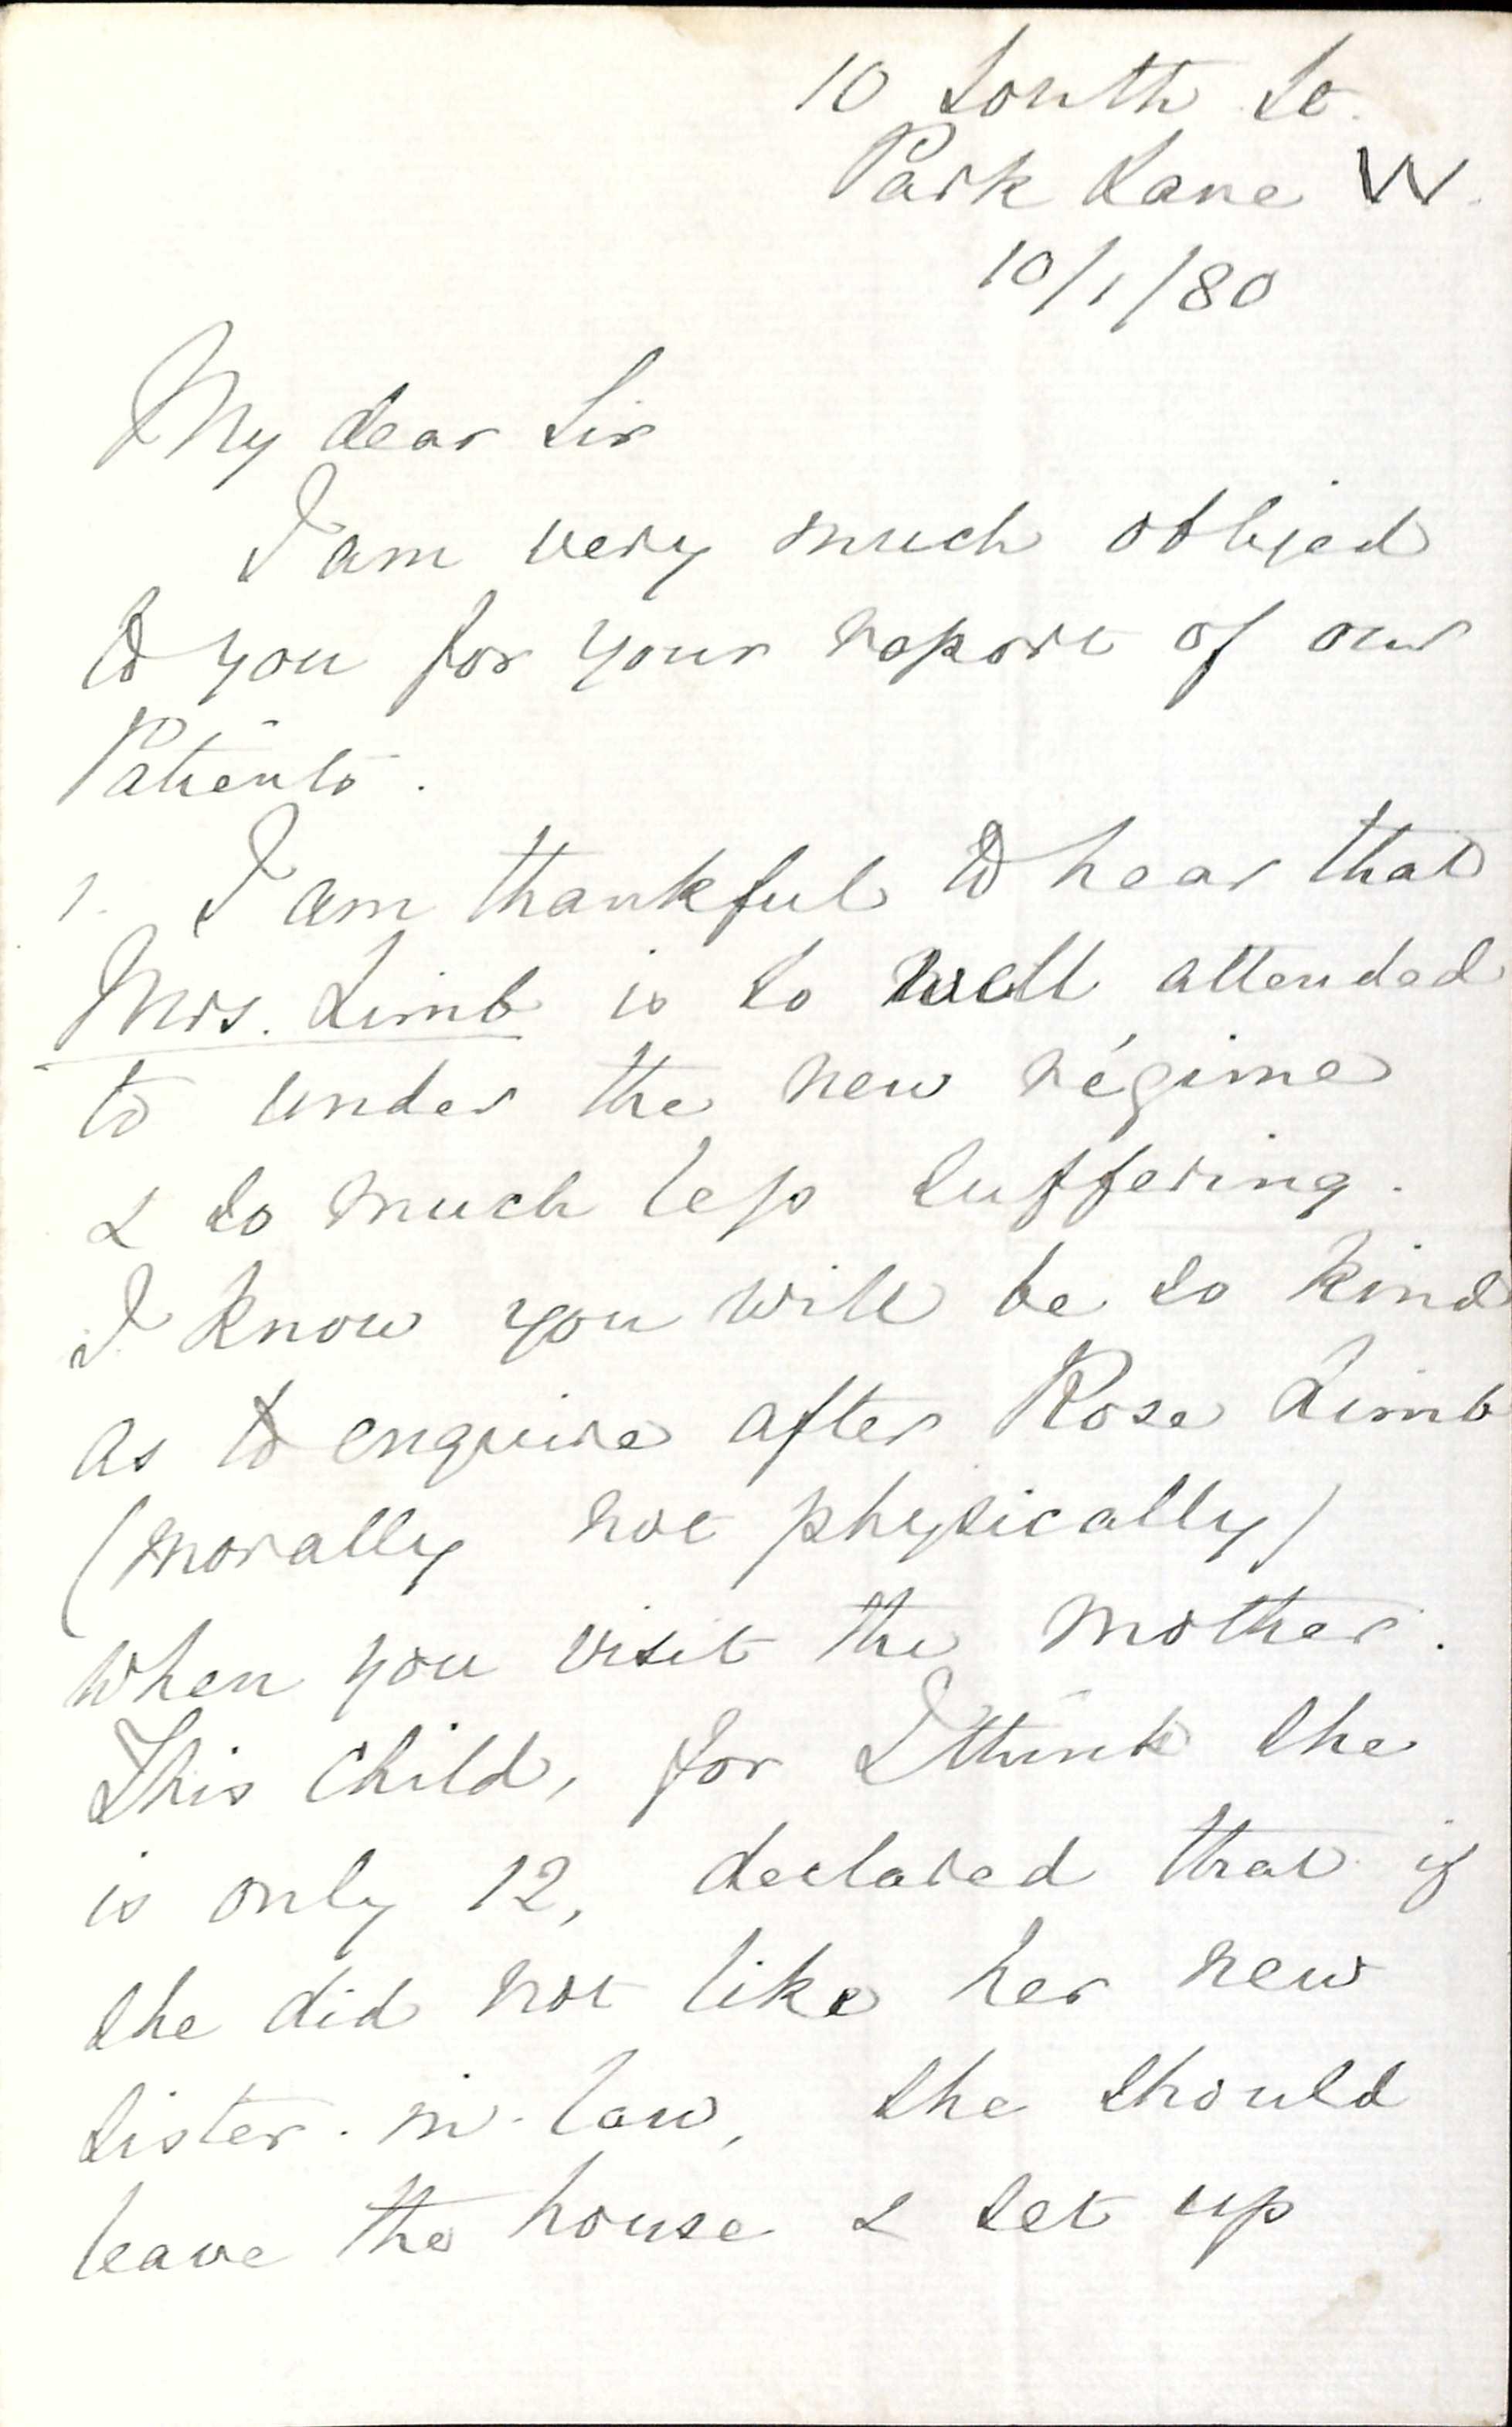 Treasure 39: Florence Nightingale's letters to C B N Dunn